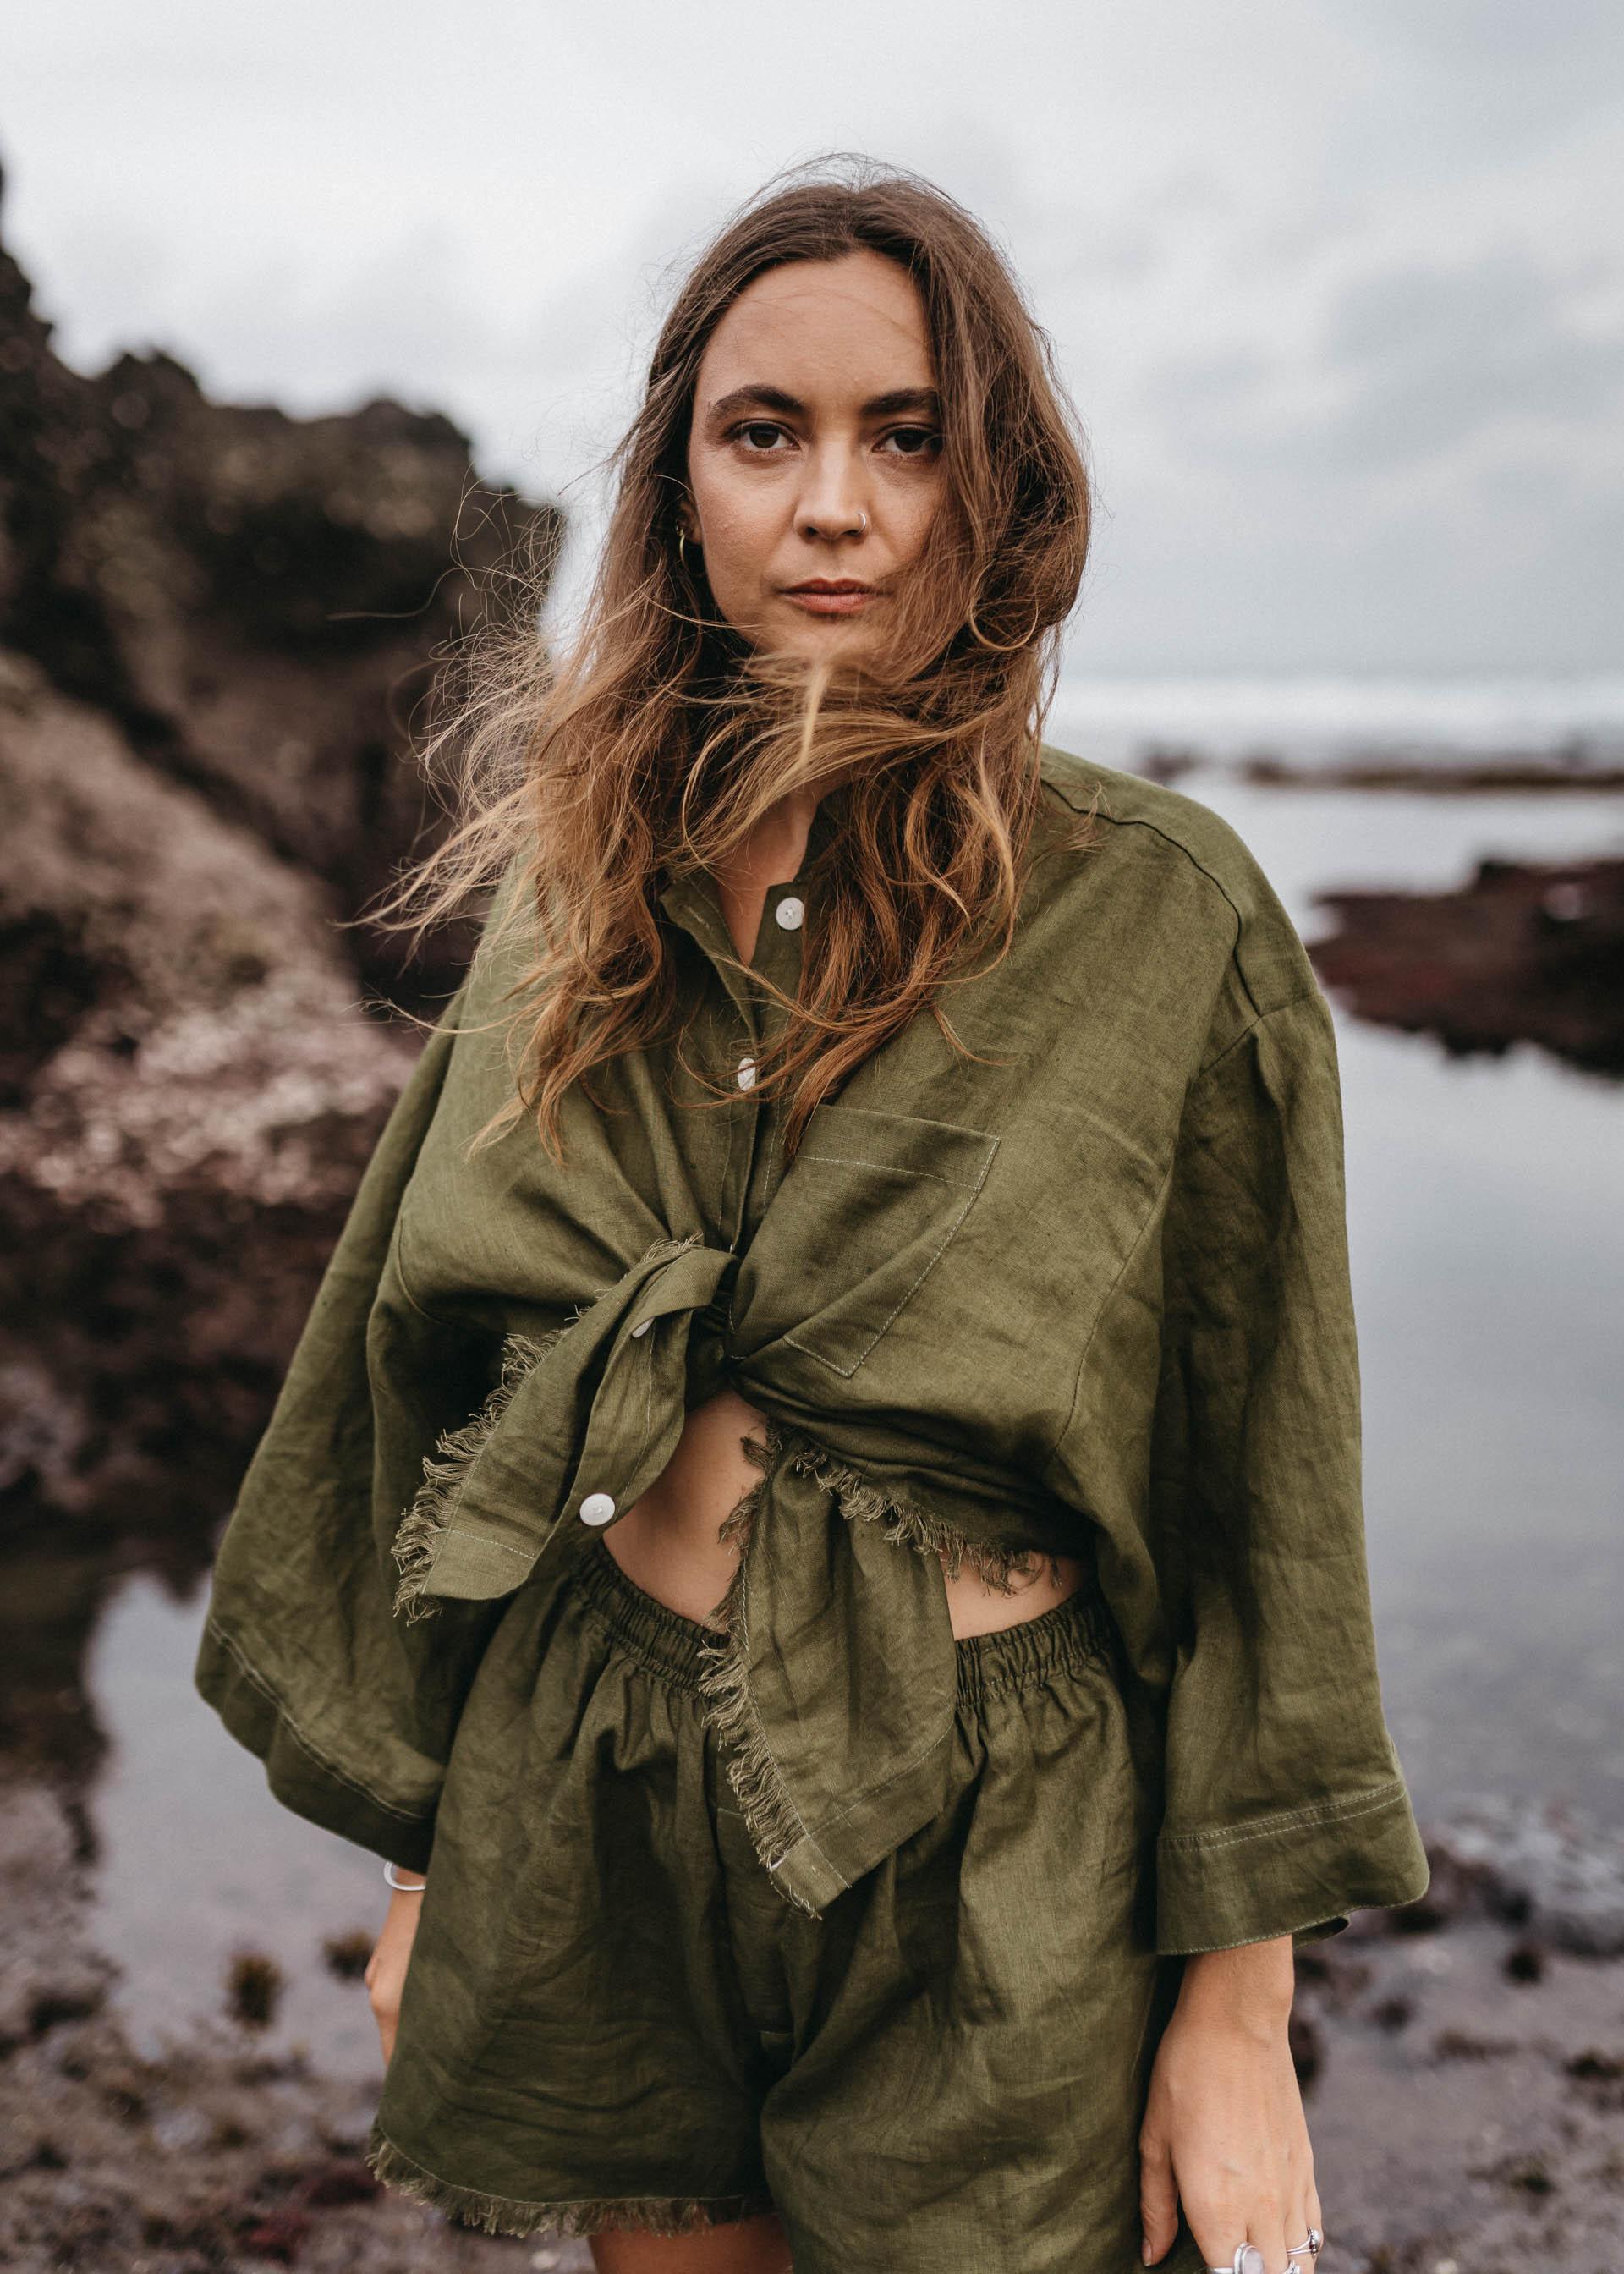 keira-mason-studio-karma-beach-green-linen-clothing.jpg